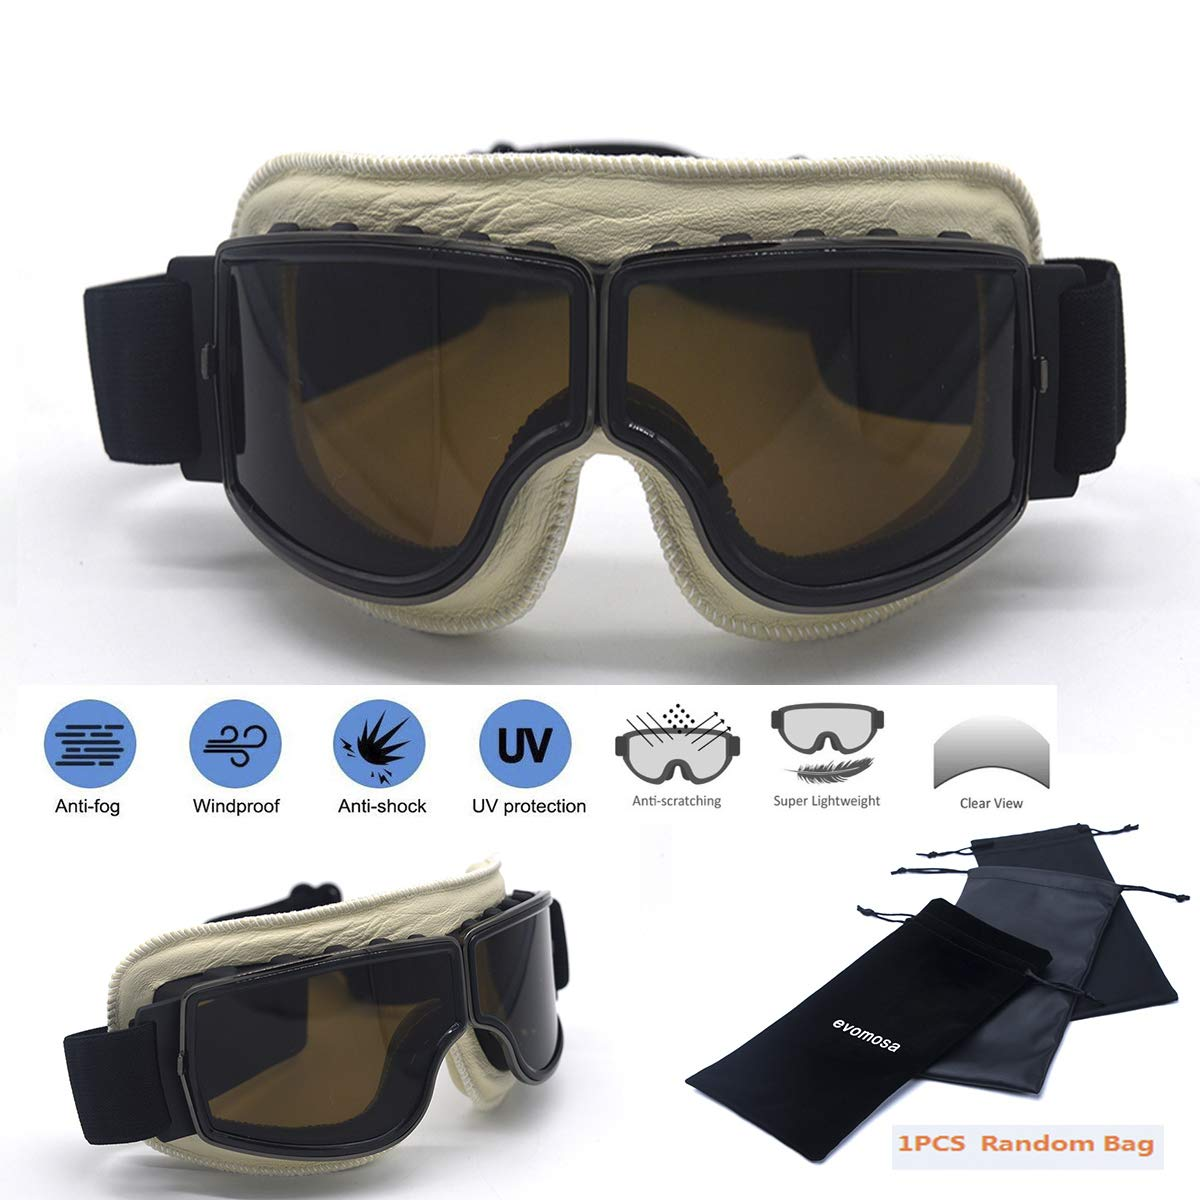 Motorcycle Glasses Sunglasses Padded Yellow Riding Anti Fog Biker goggle Moped